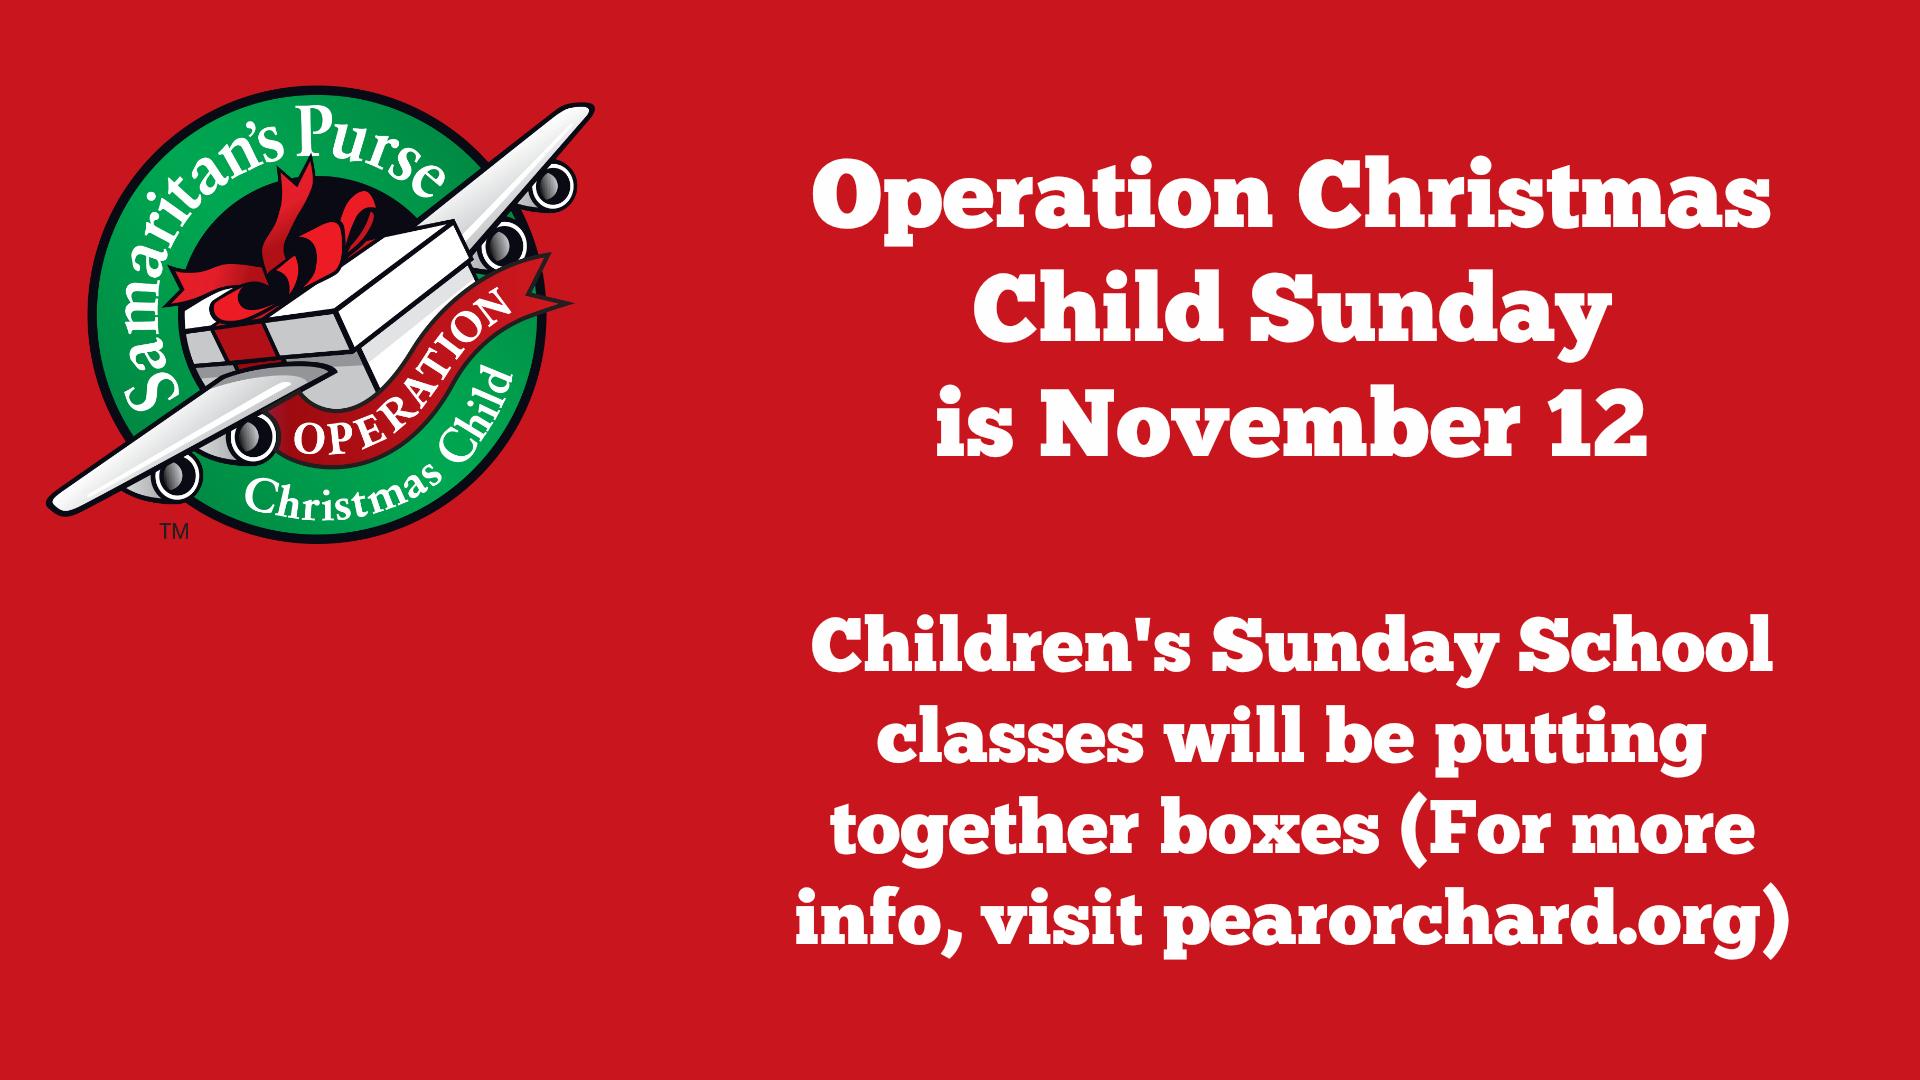 operation christmas child 1.jpg